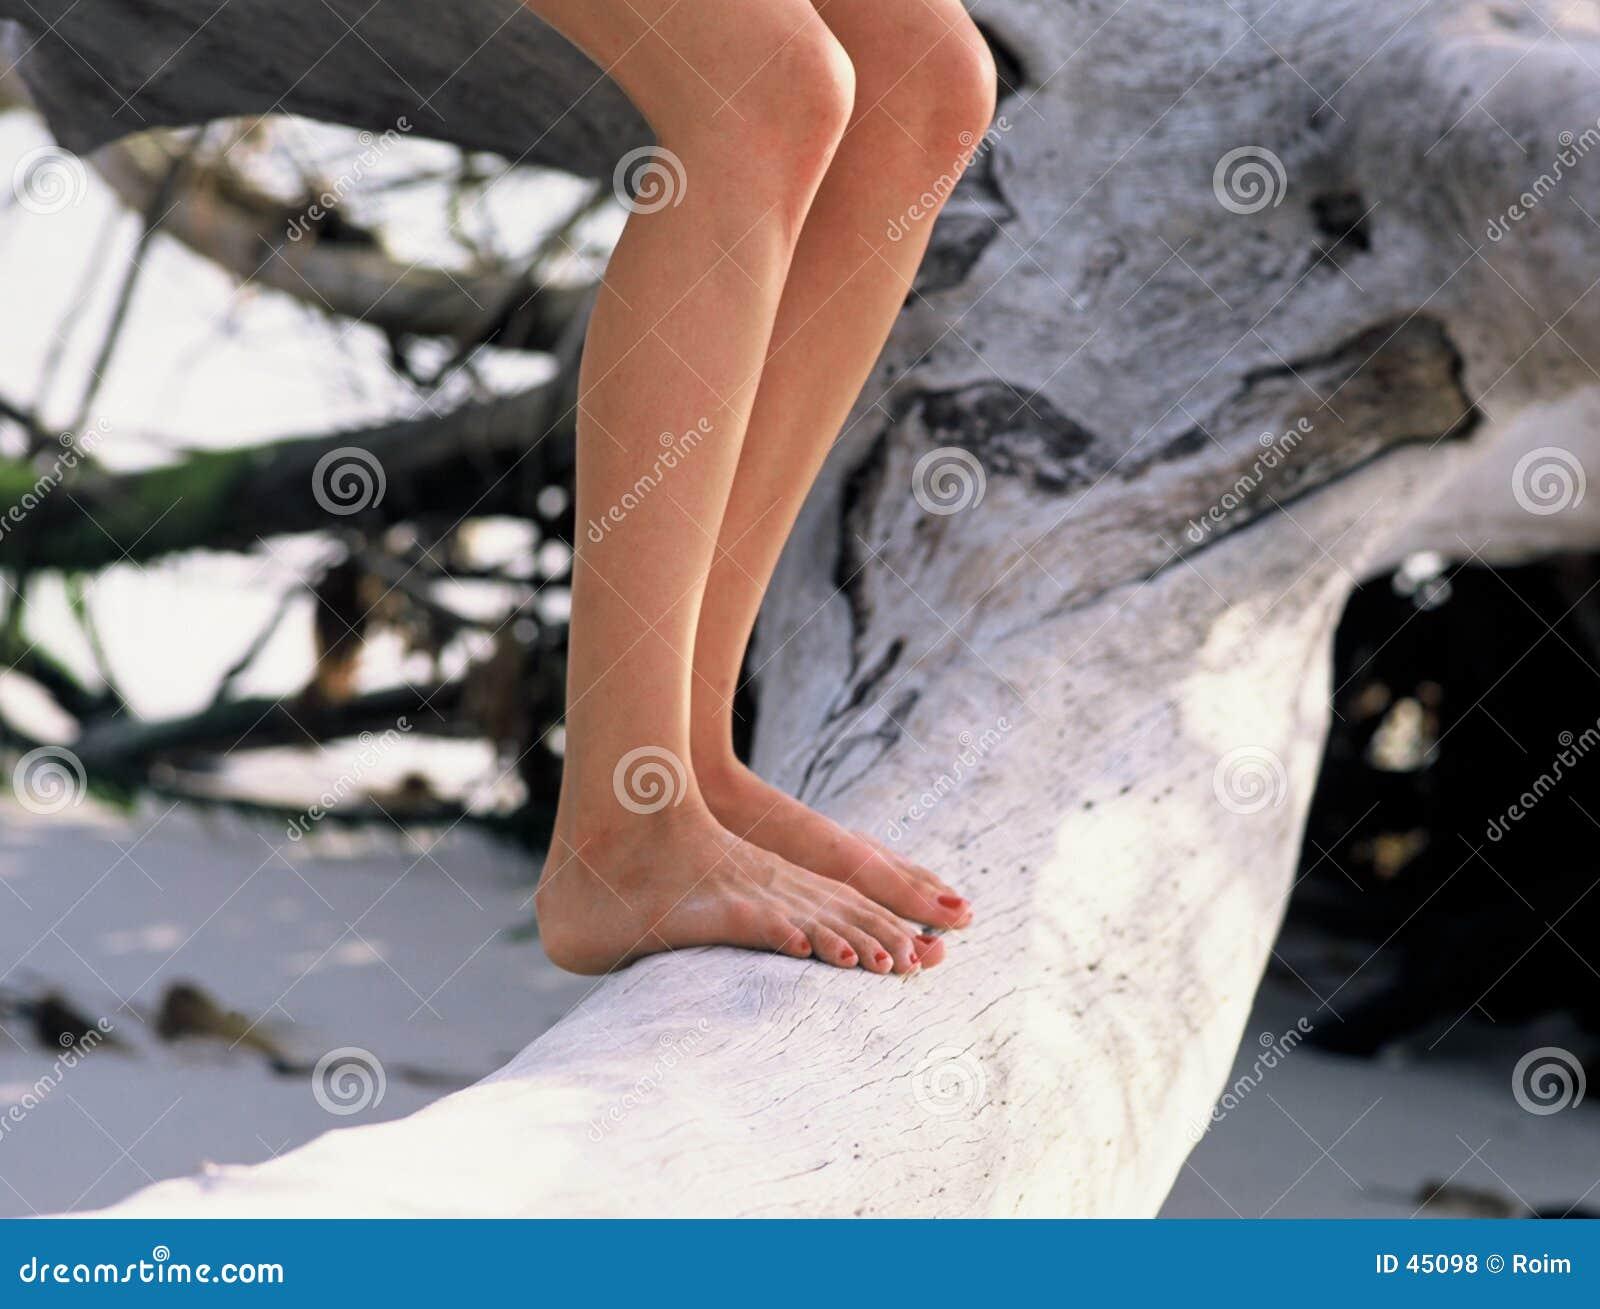 Standing on Log